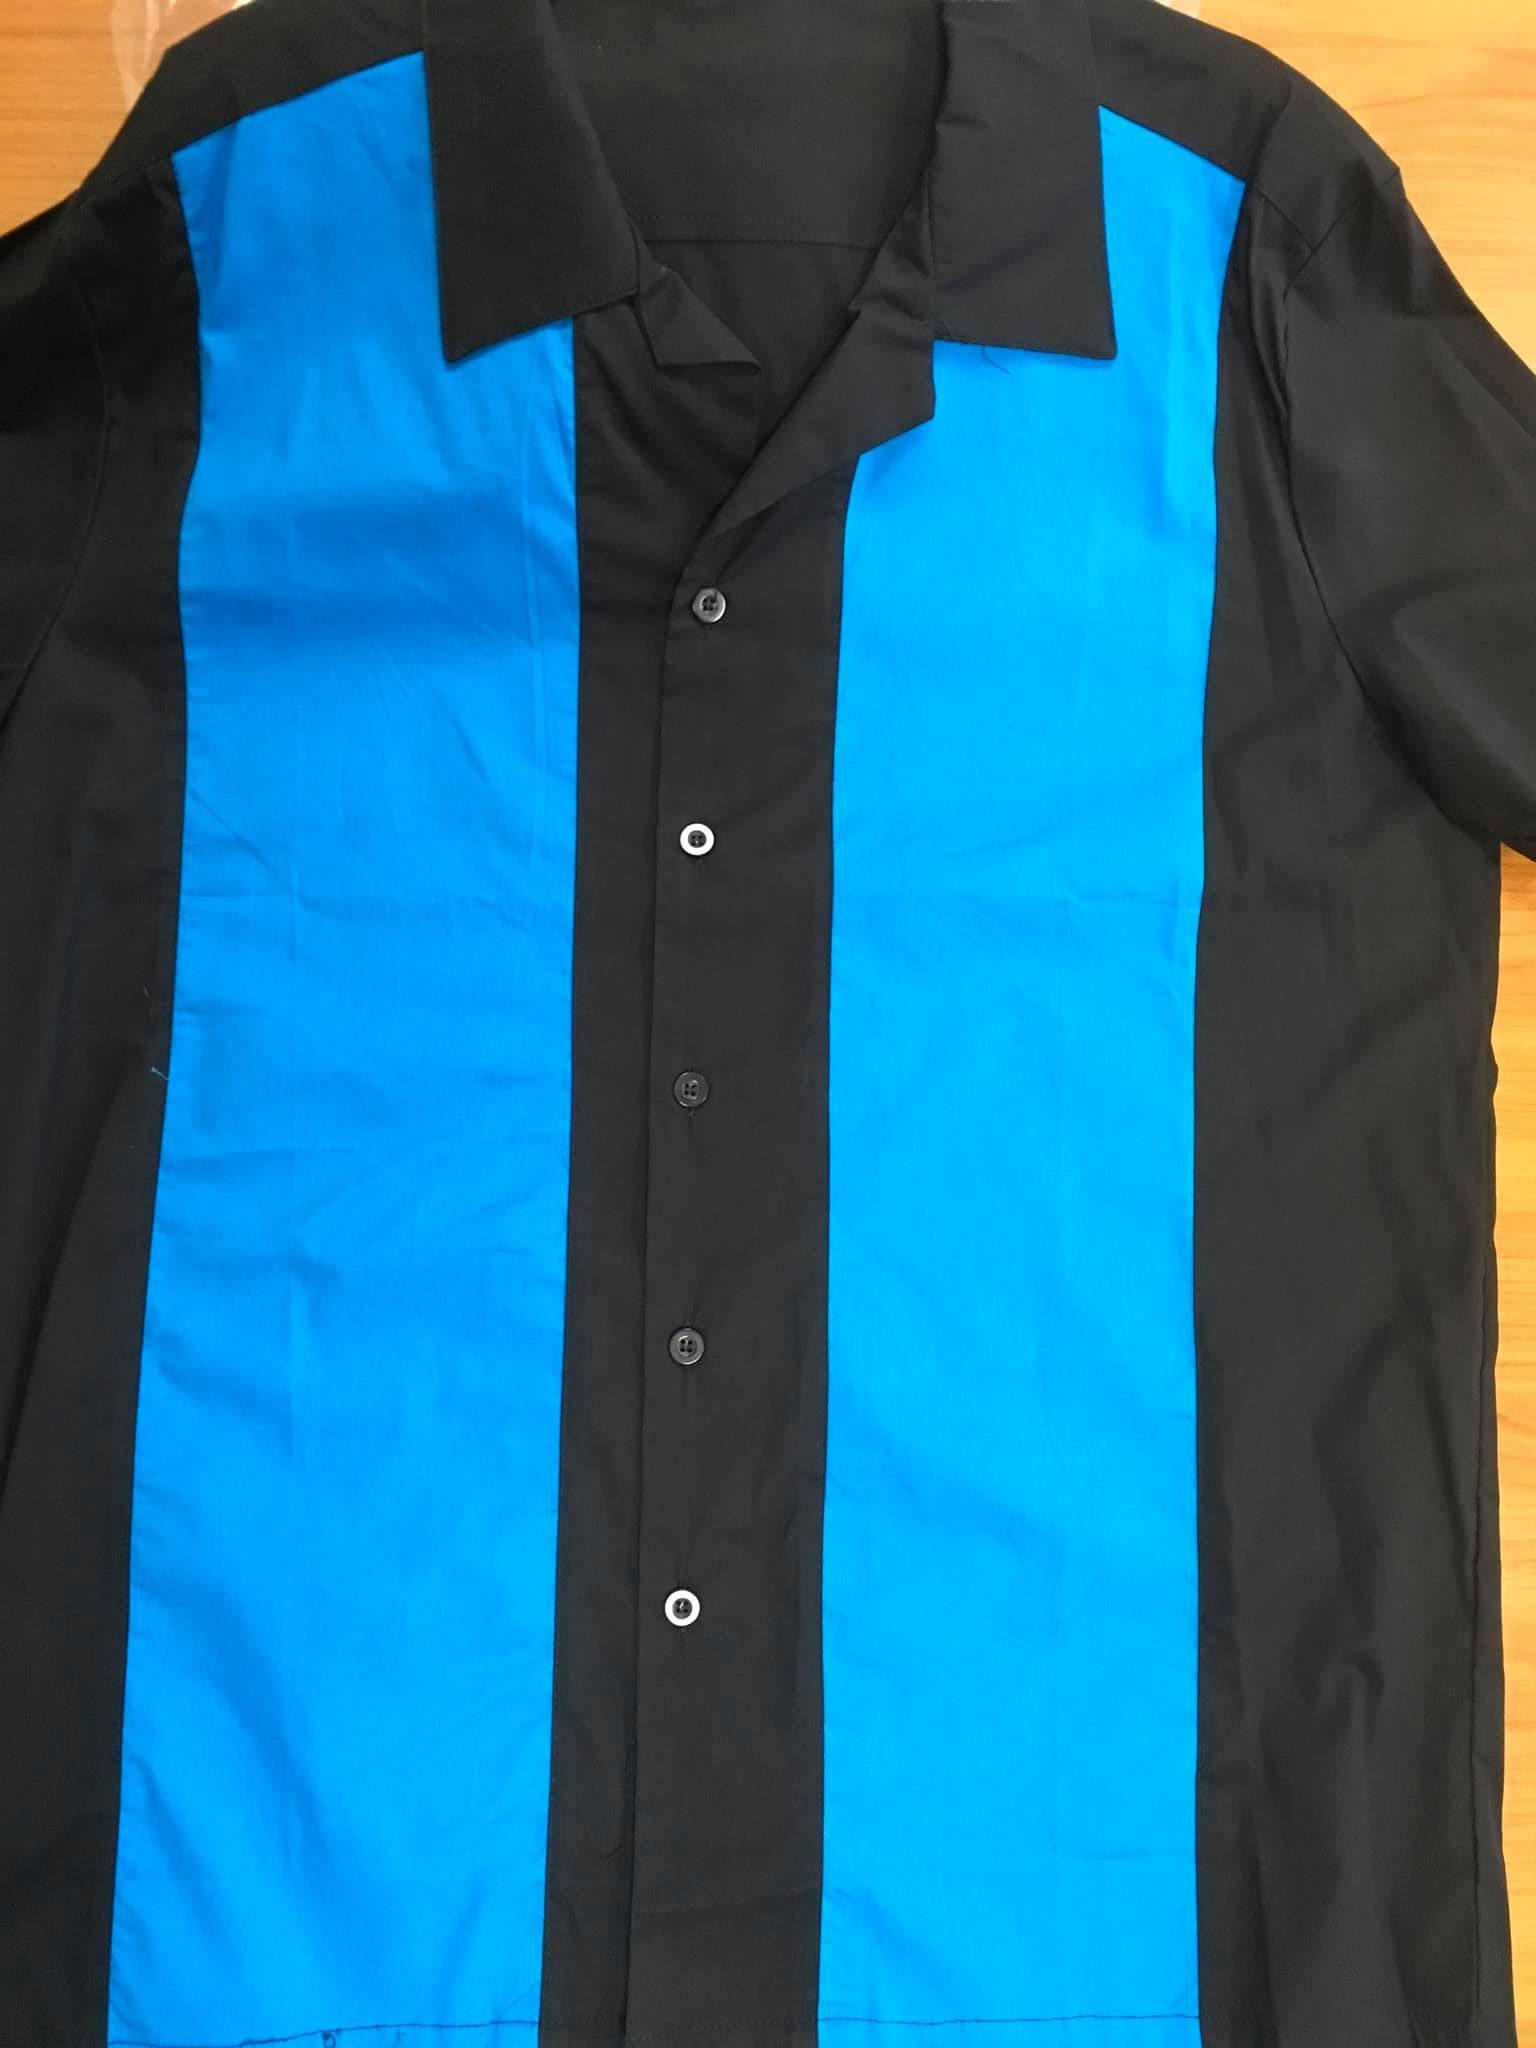 Splinter Bowling Short ( Black With Blue Front Panels )